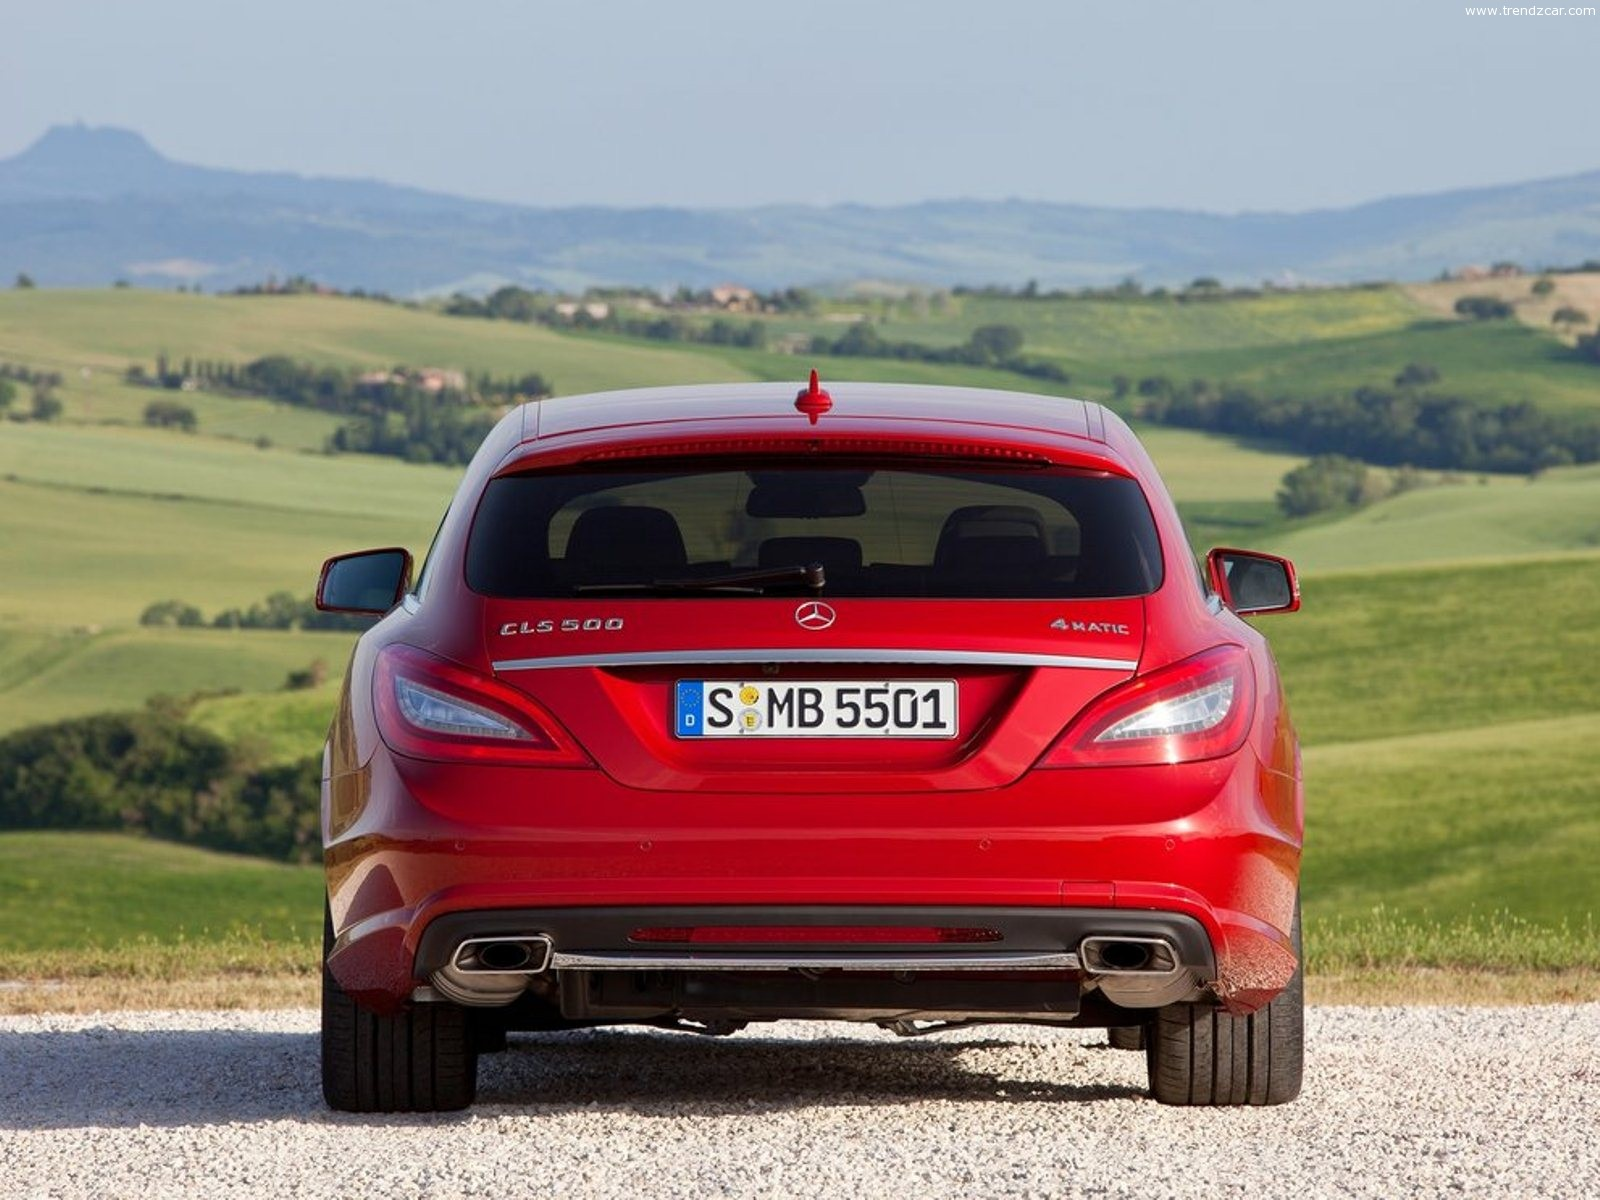 2013 Mercedes Benz CLS Shooting Brake Rear View